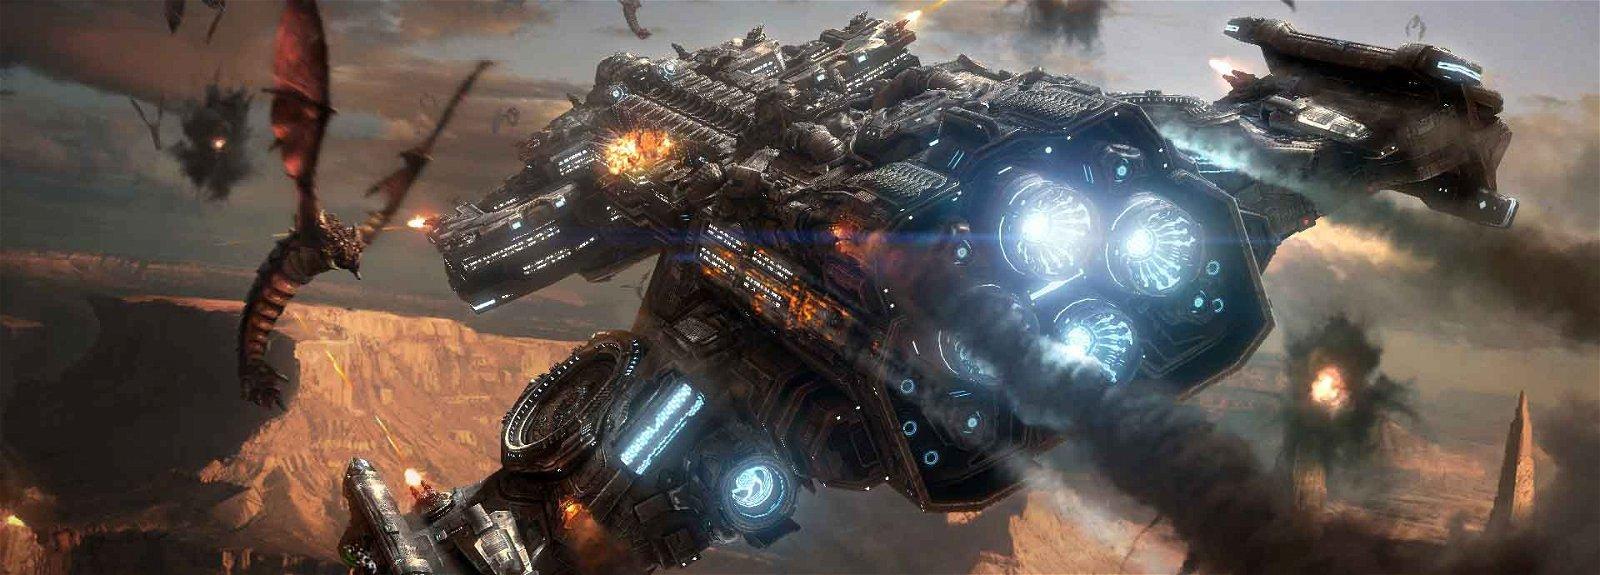 Battlecruisermisd.jpg